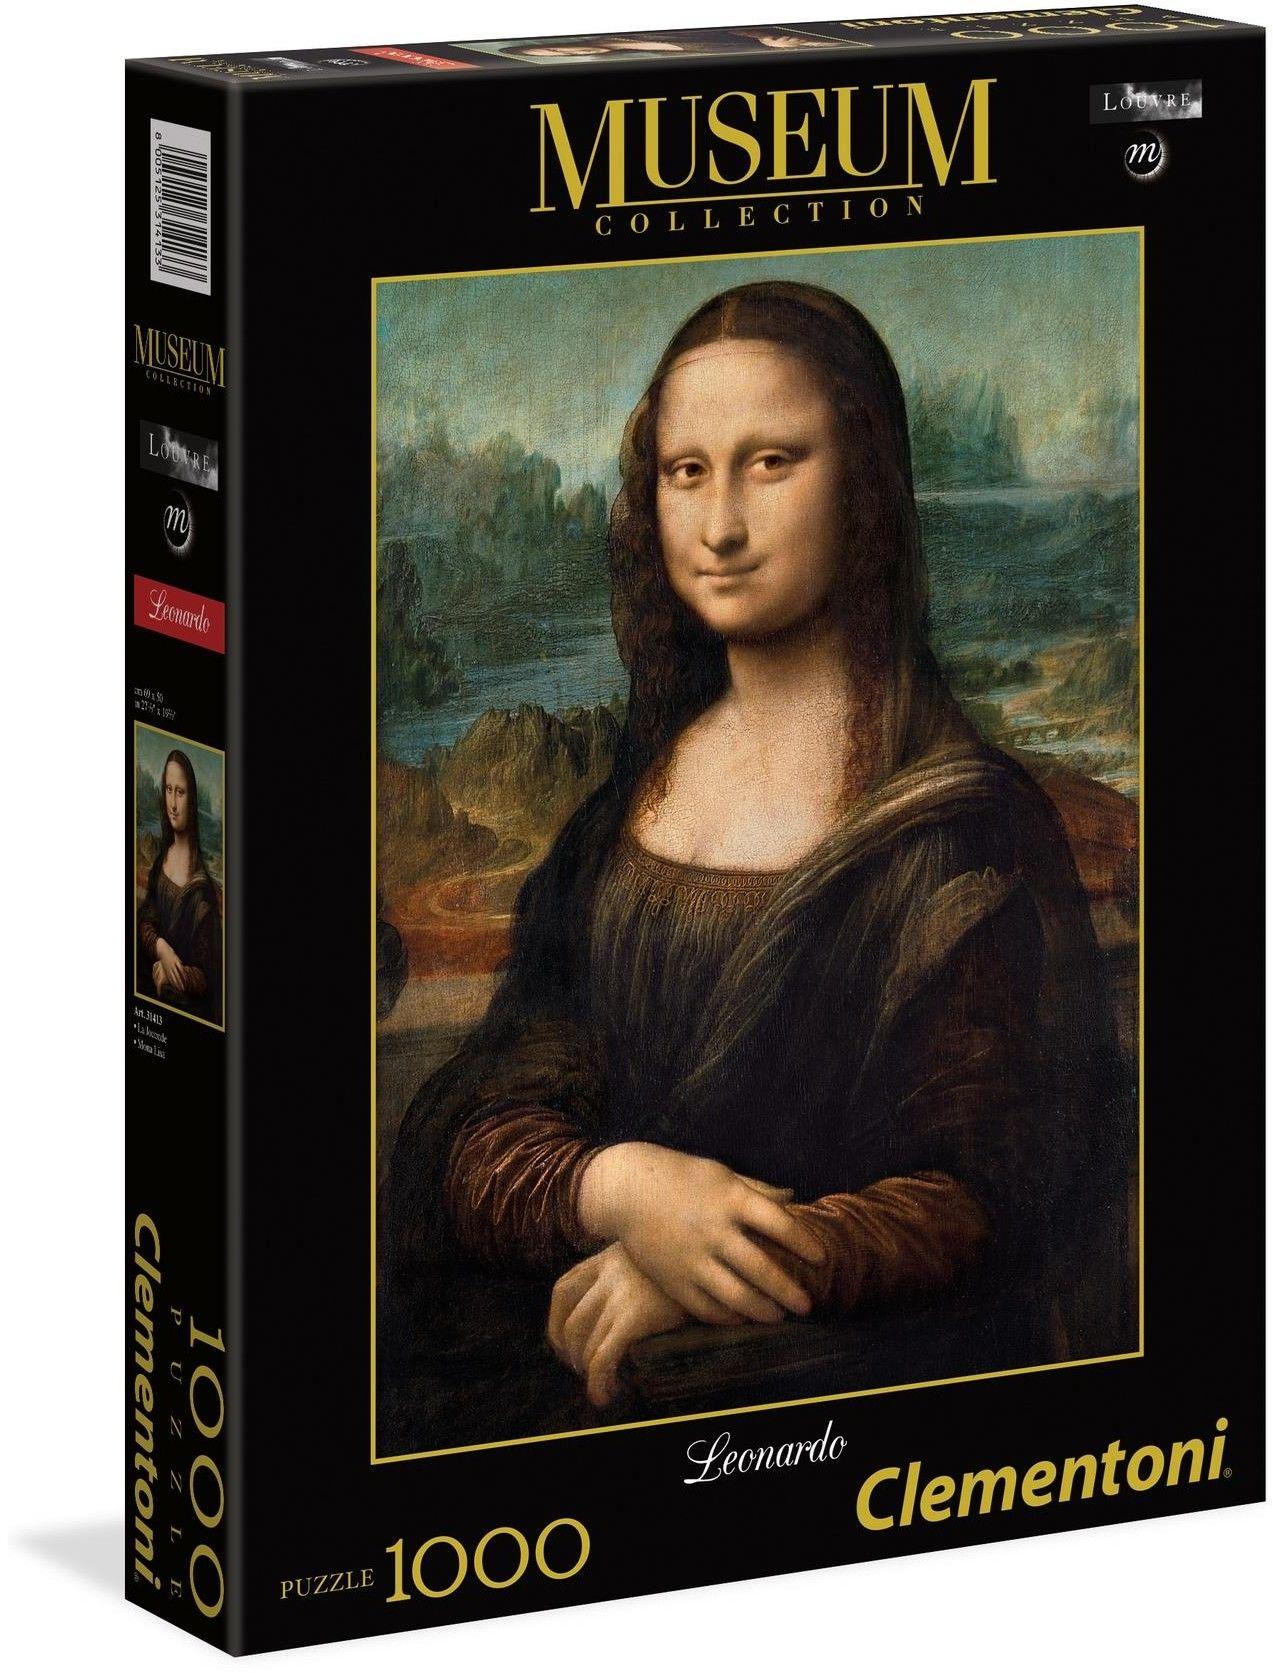 Clementoni - Clementoni Puzzle Museum Collection Mona Lisa Leonardo 1000 el. 31413